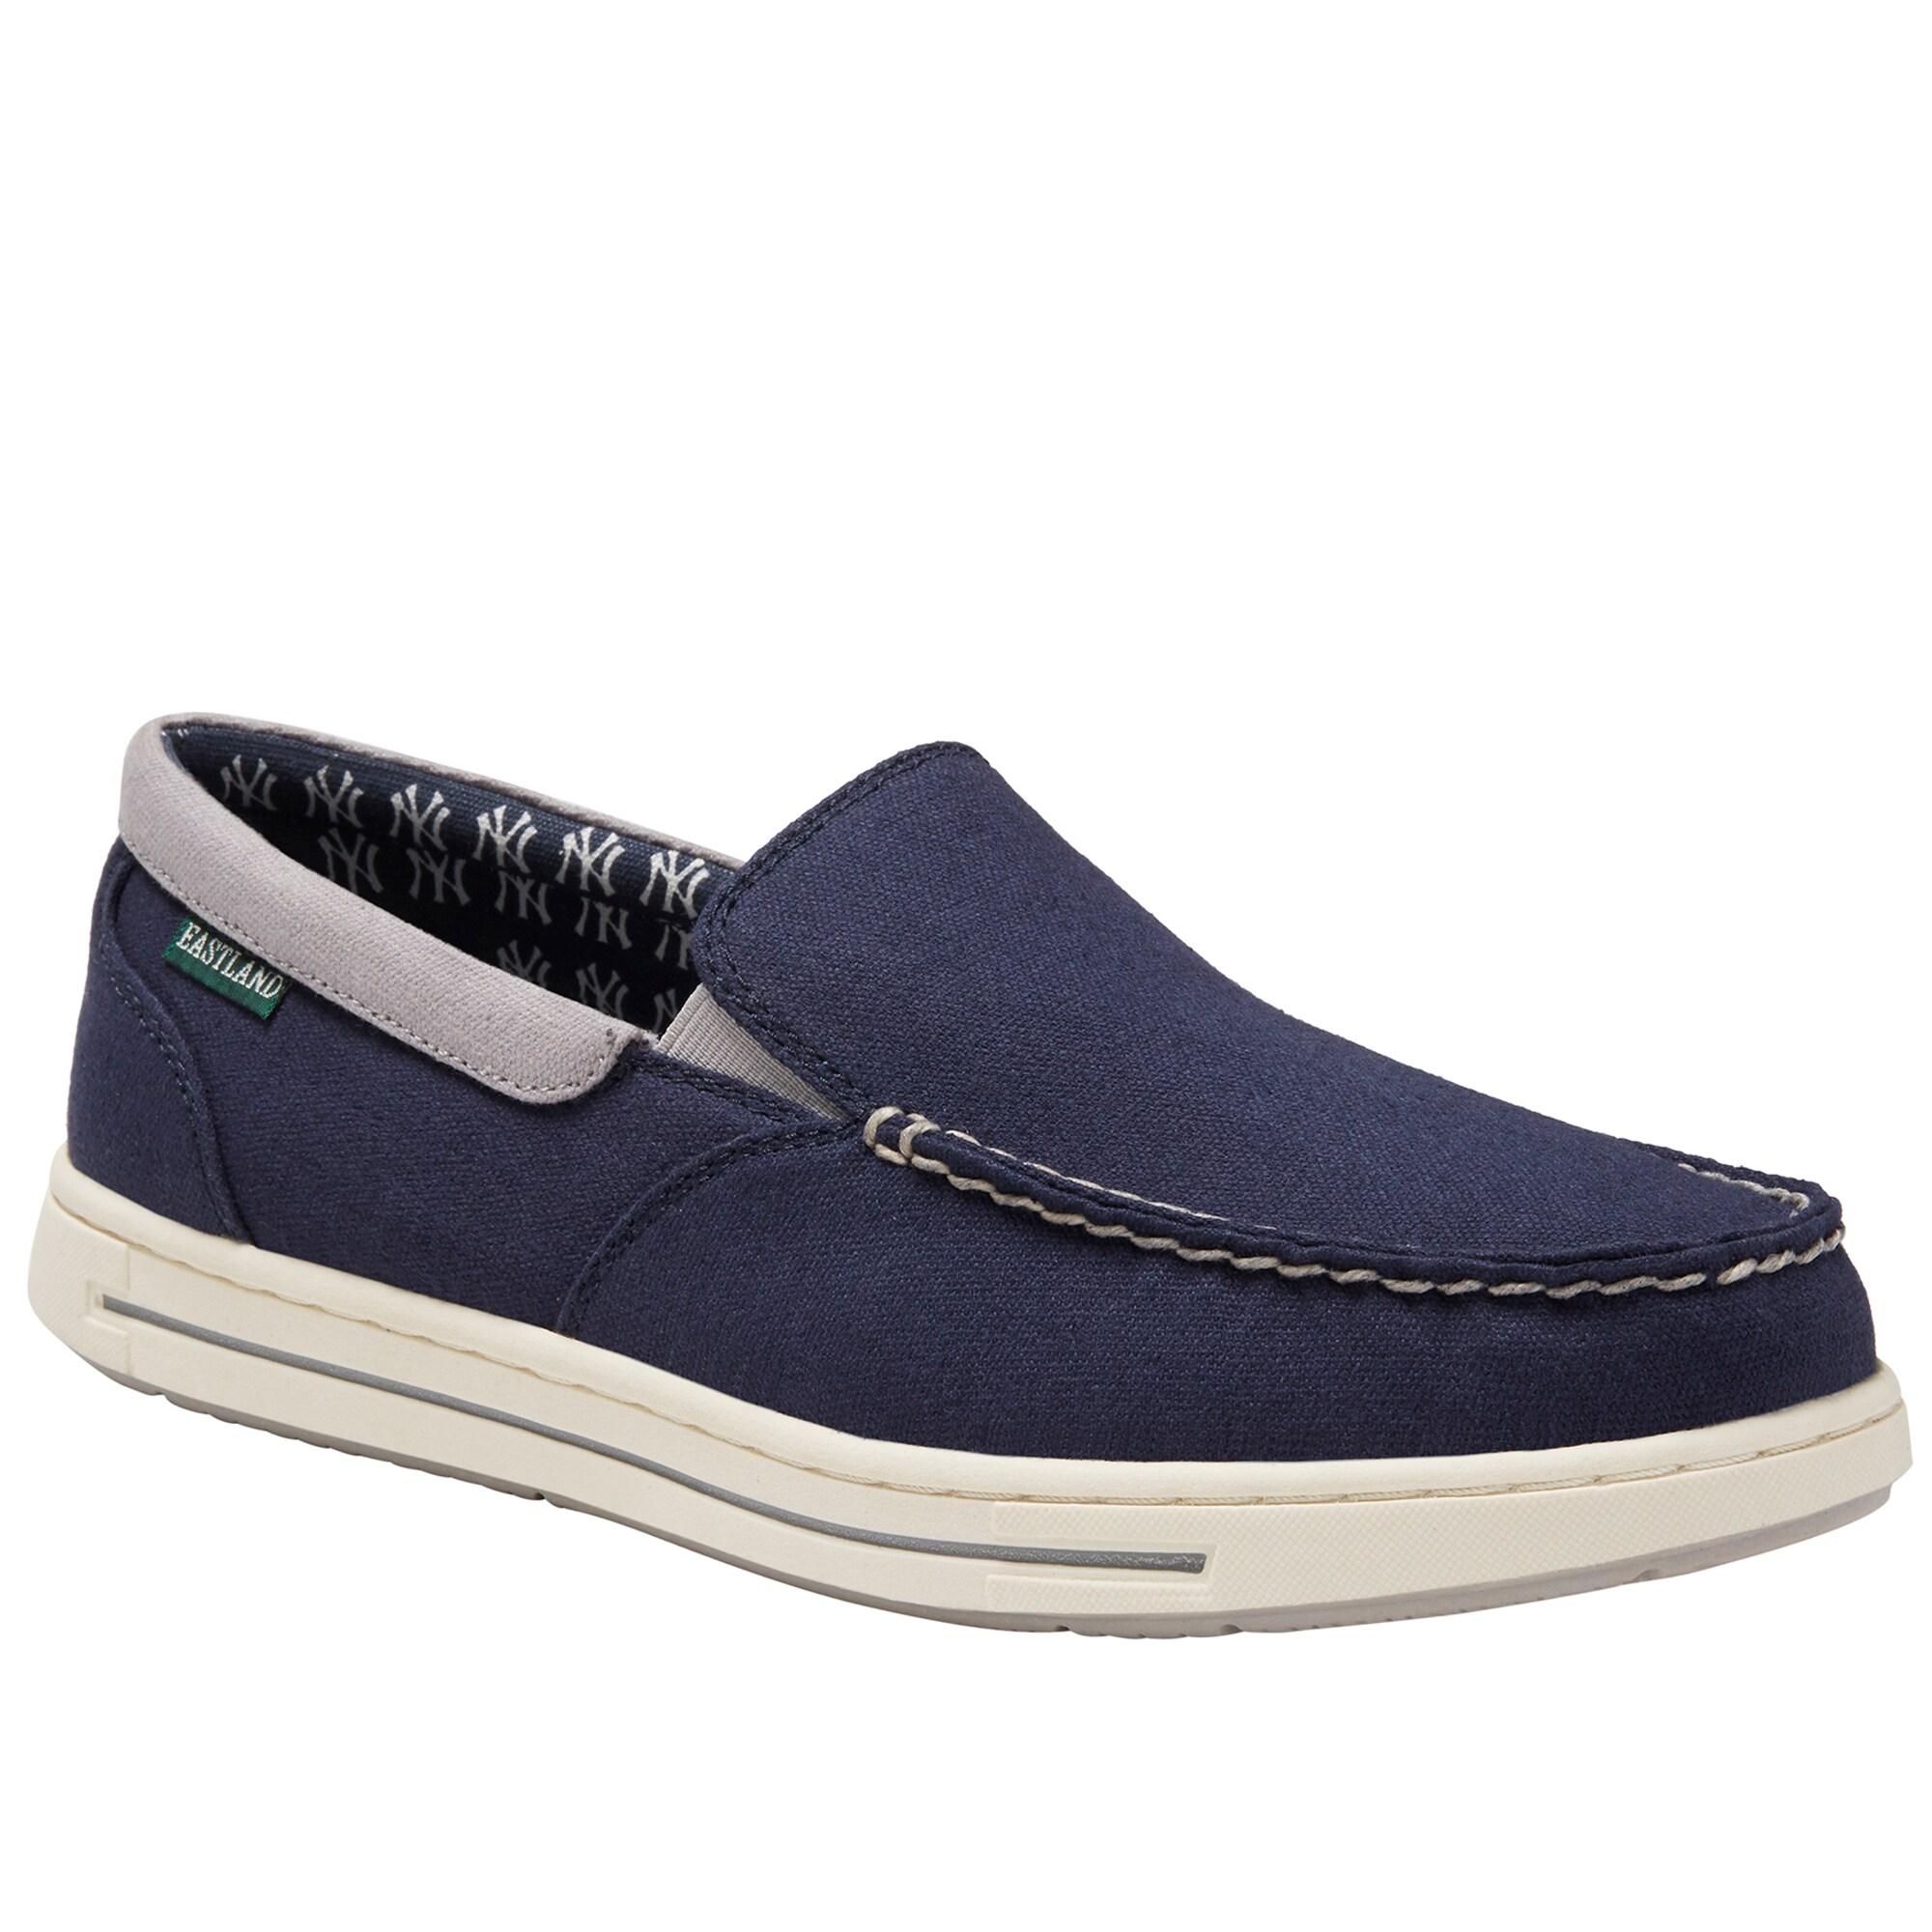 New York Yankees Eastland Slip-On Surf Shoes - Navy